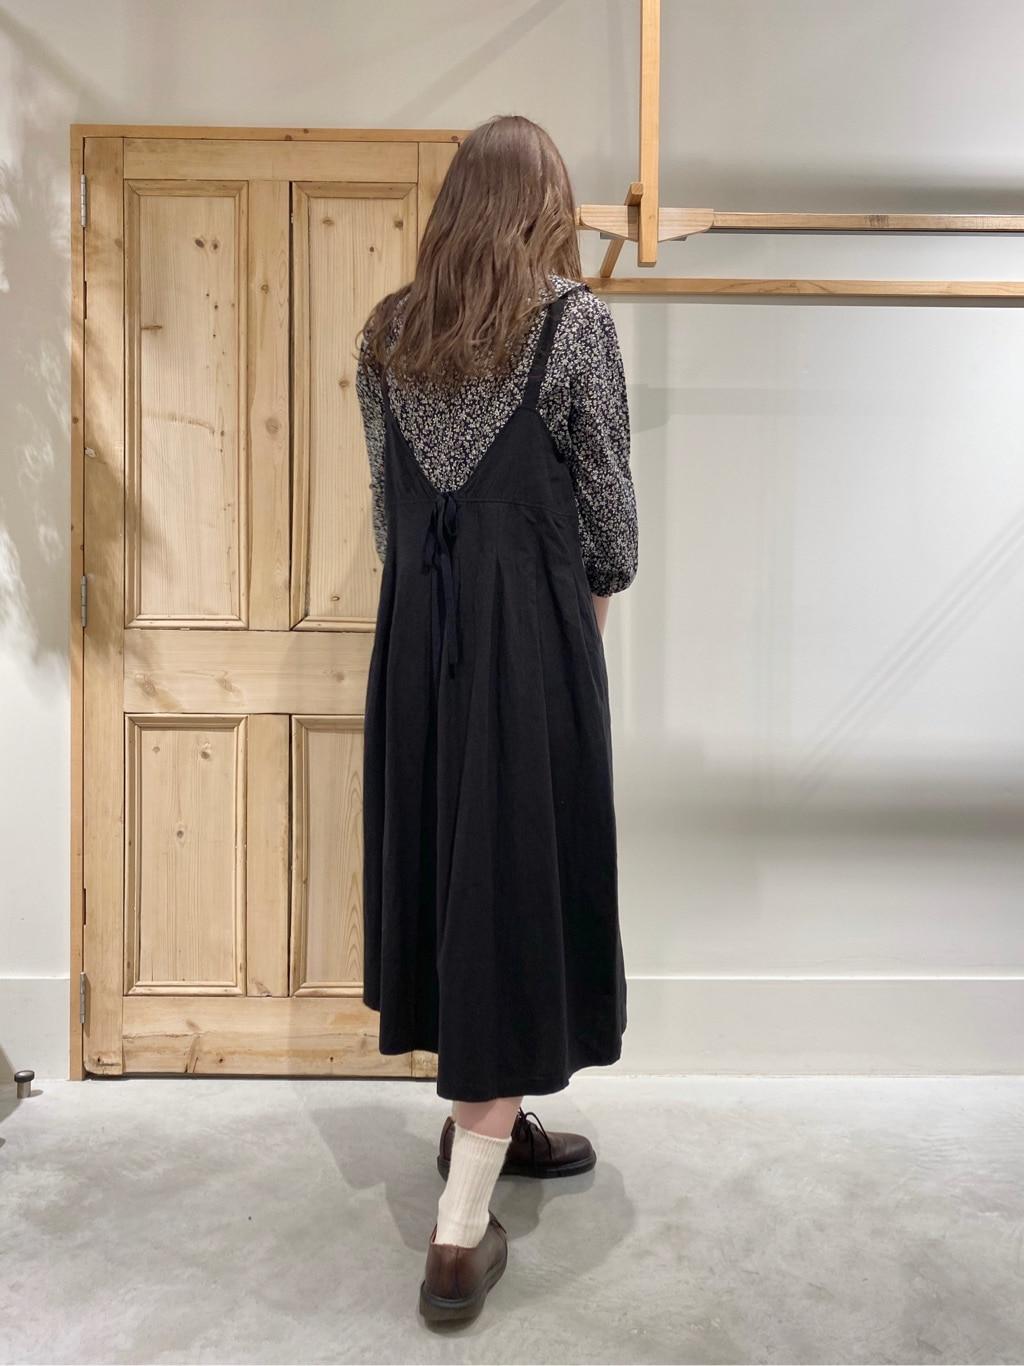 Malle chambre de charme 調布パルコ 身長:167cm 2020.06.09